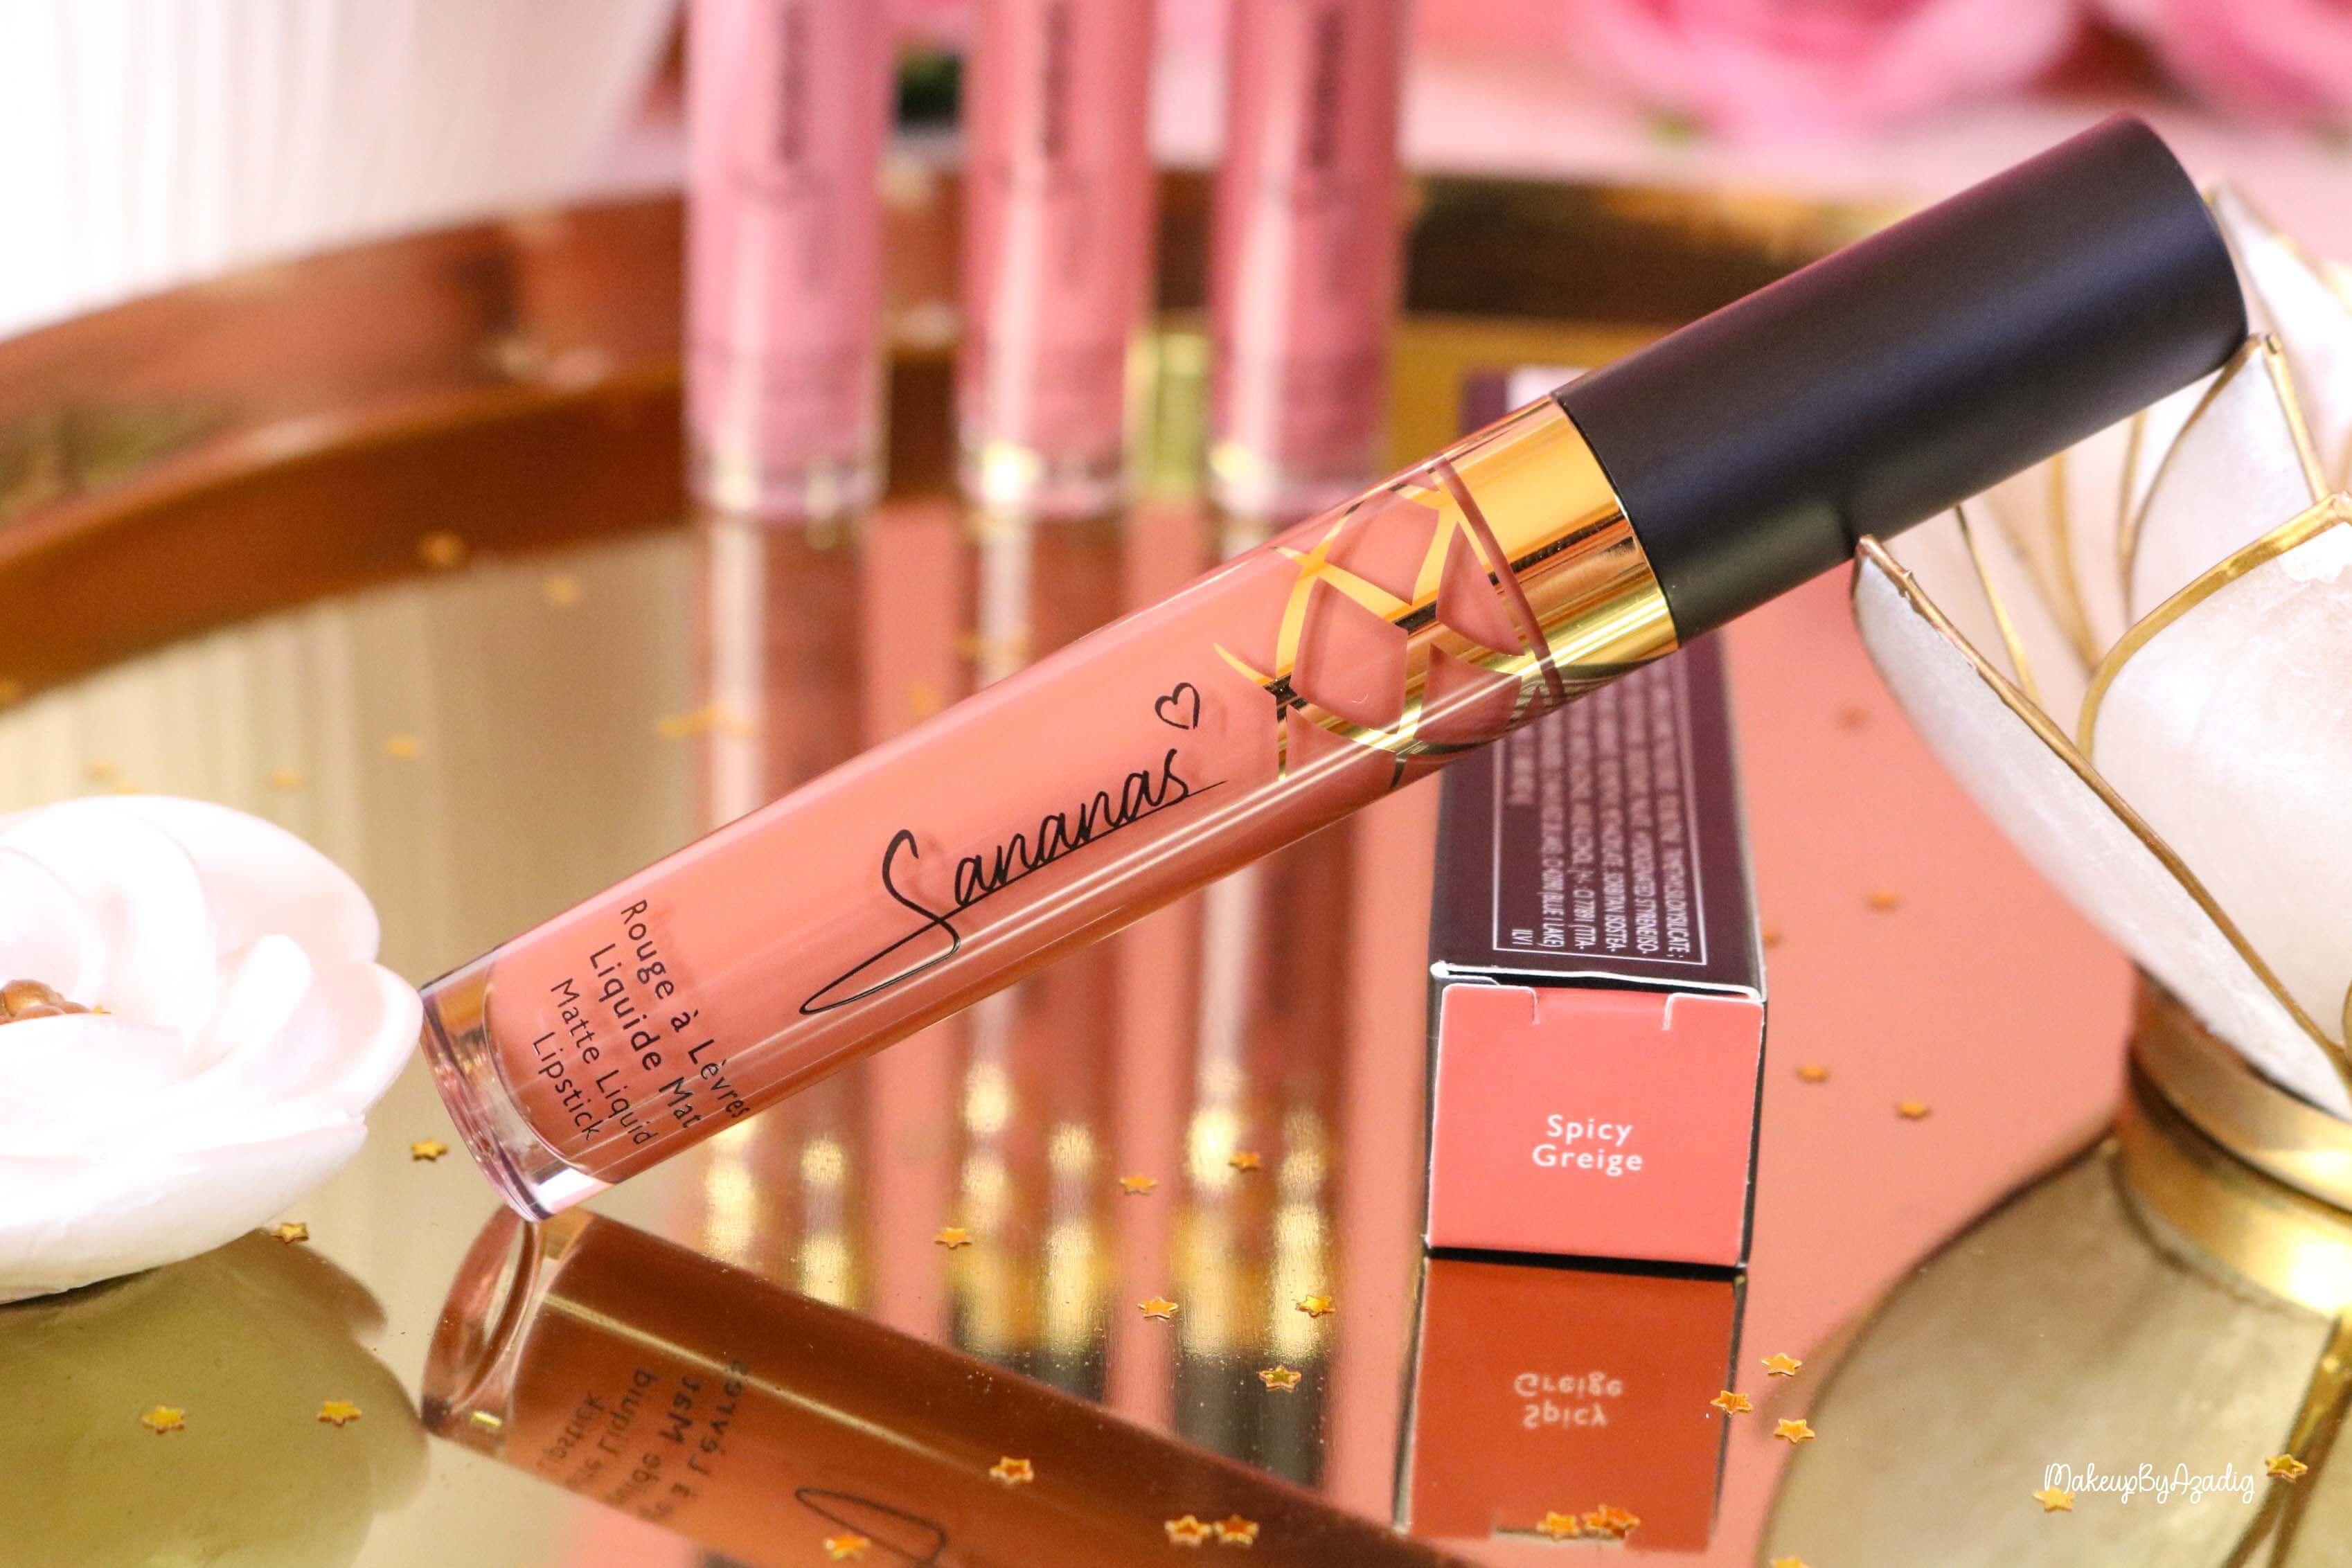 revue-marque-sananas-beauty-rouge-a-levres-vernis-kit-avis-prix-amazon-makeupbyazadig-dusty-pink-greige-rosier-spicy